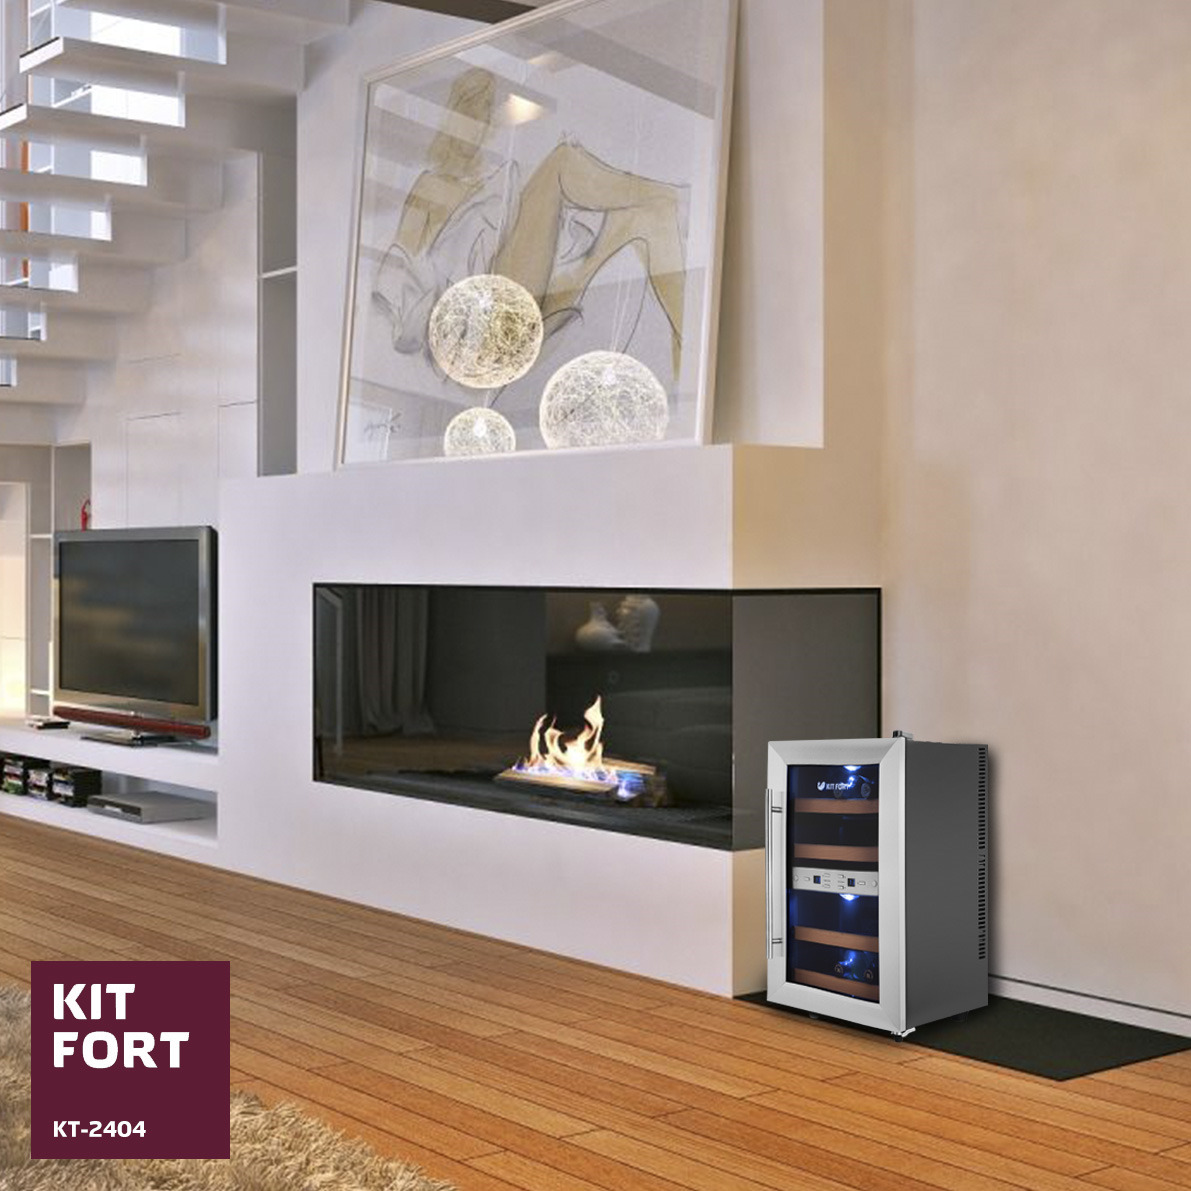 Винный шкаф Kitfort, КТ-2404 Kitfort